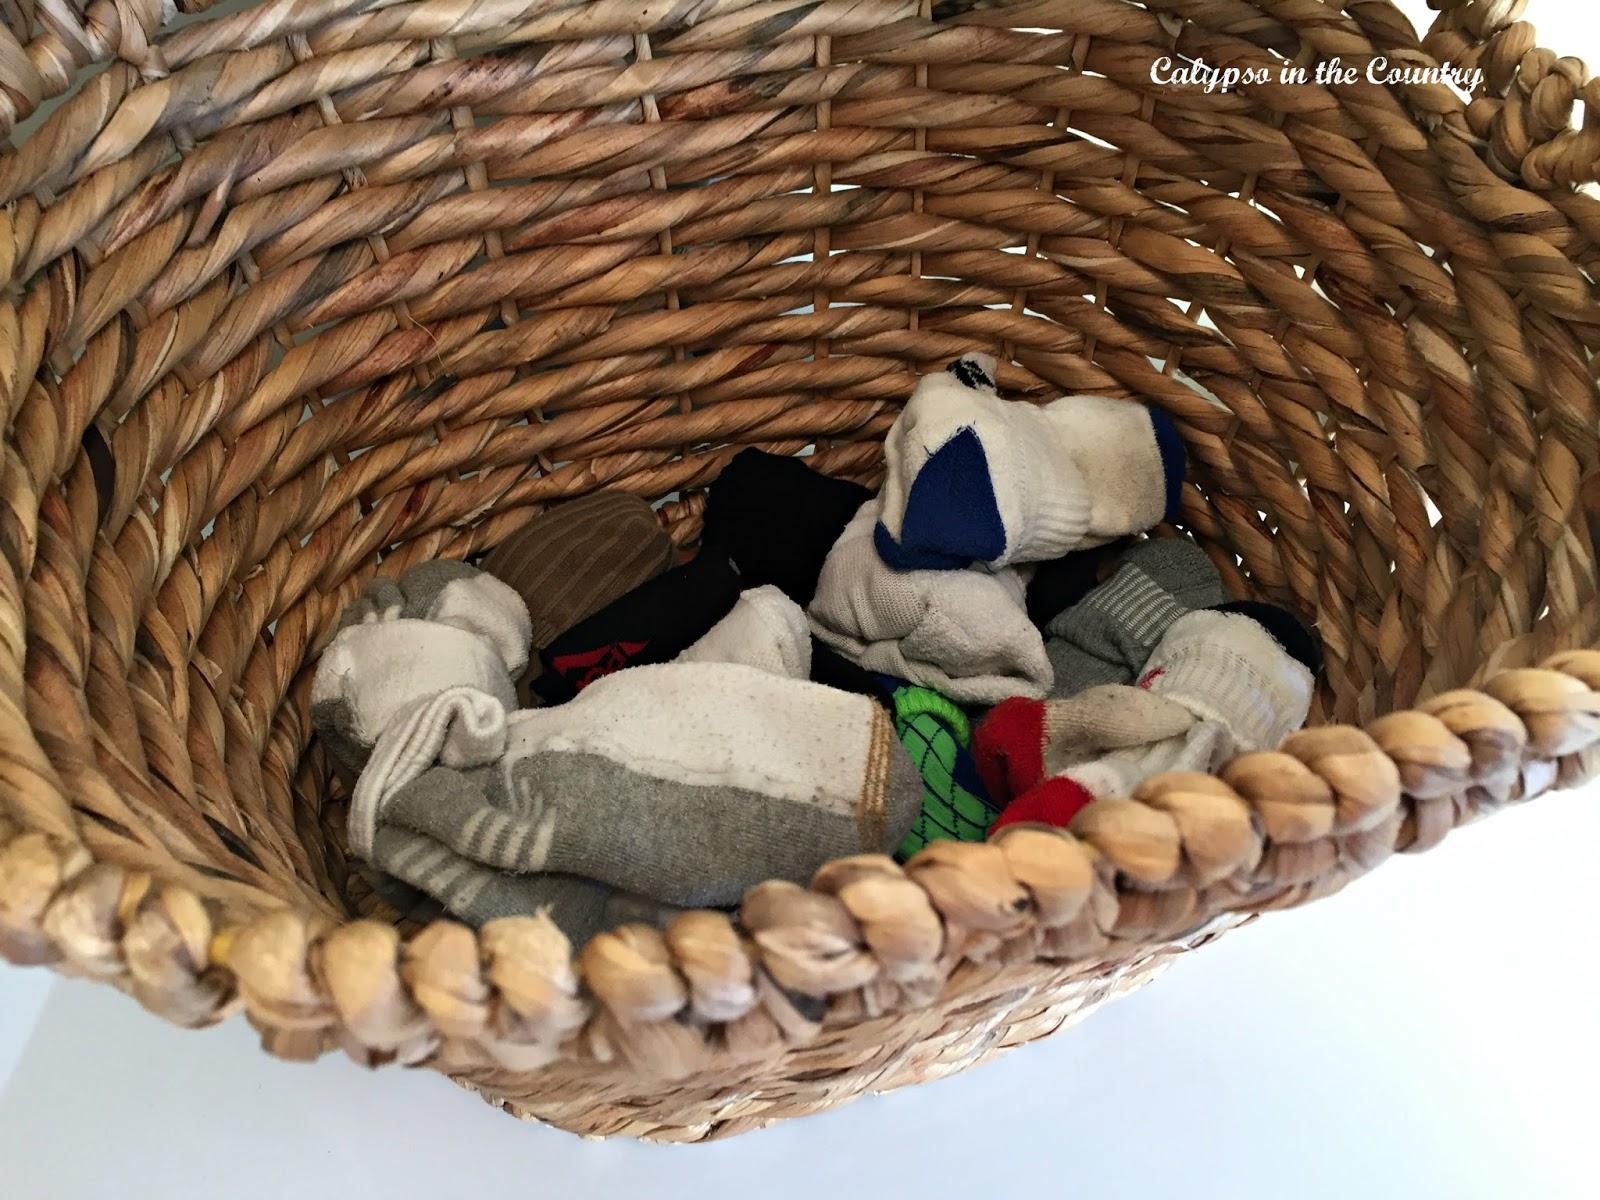 Basket of socks